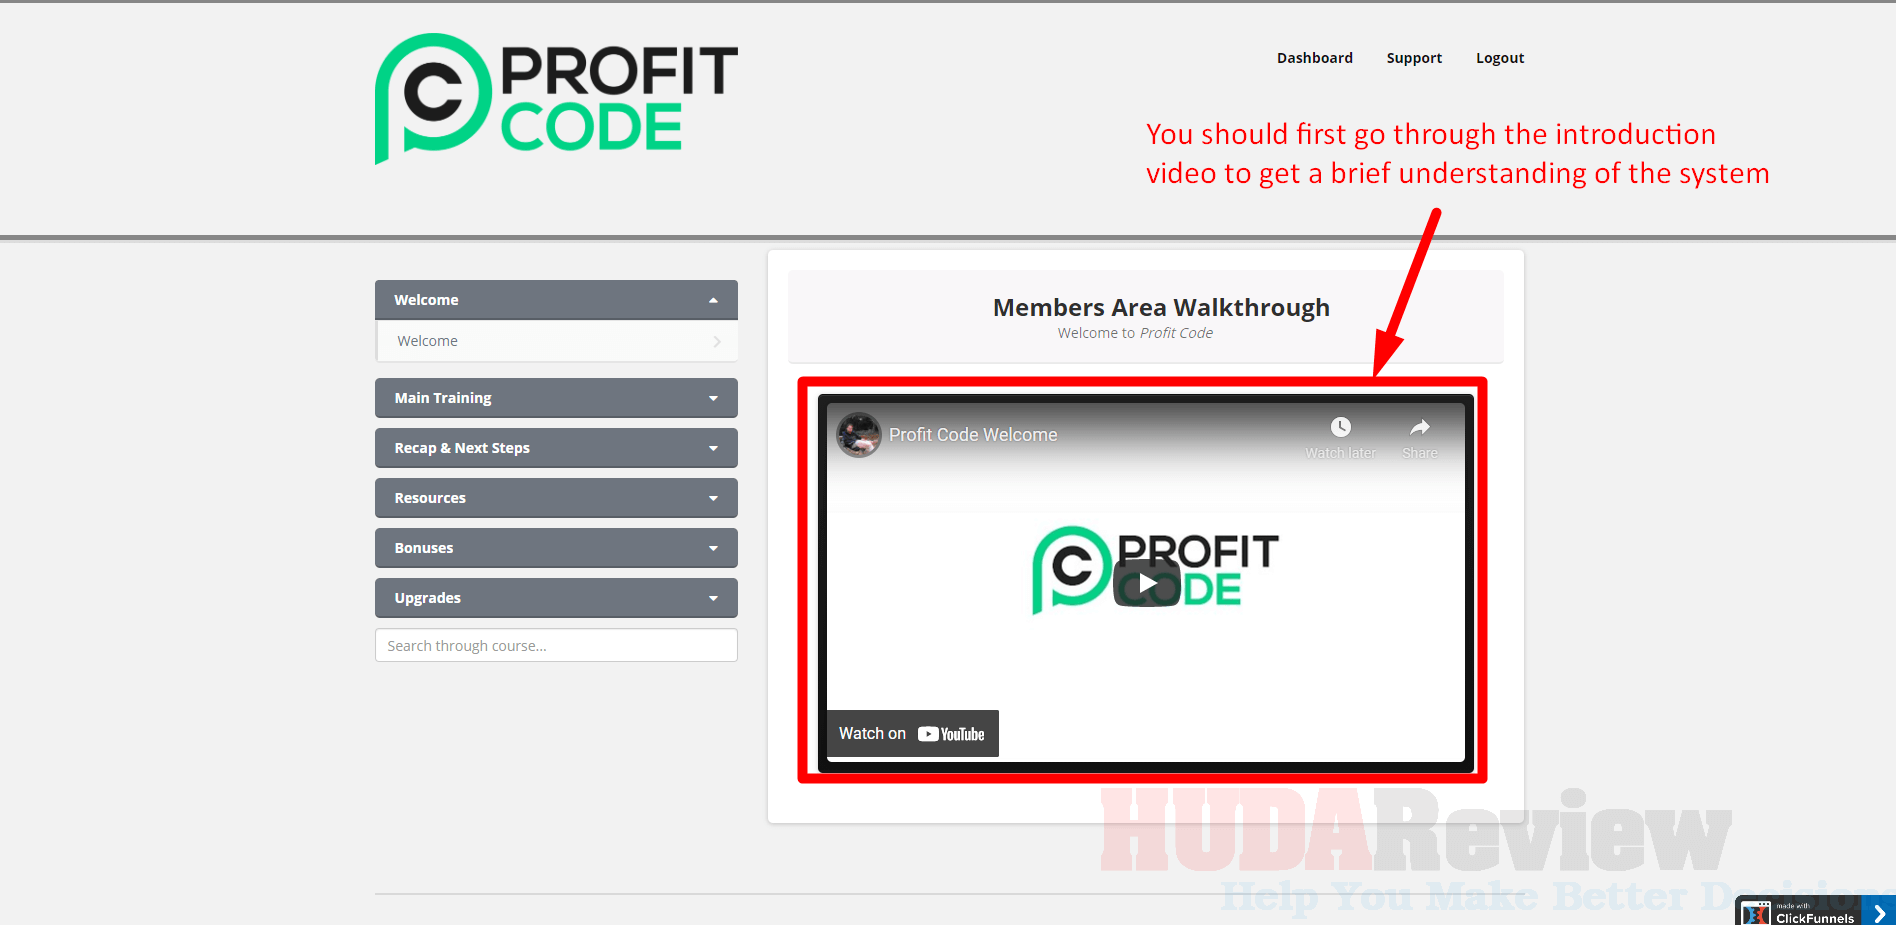 Profit-Code-Step-1